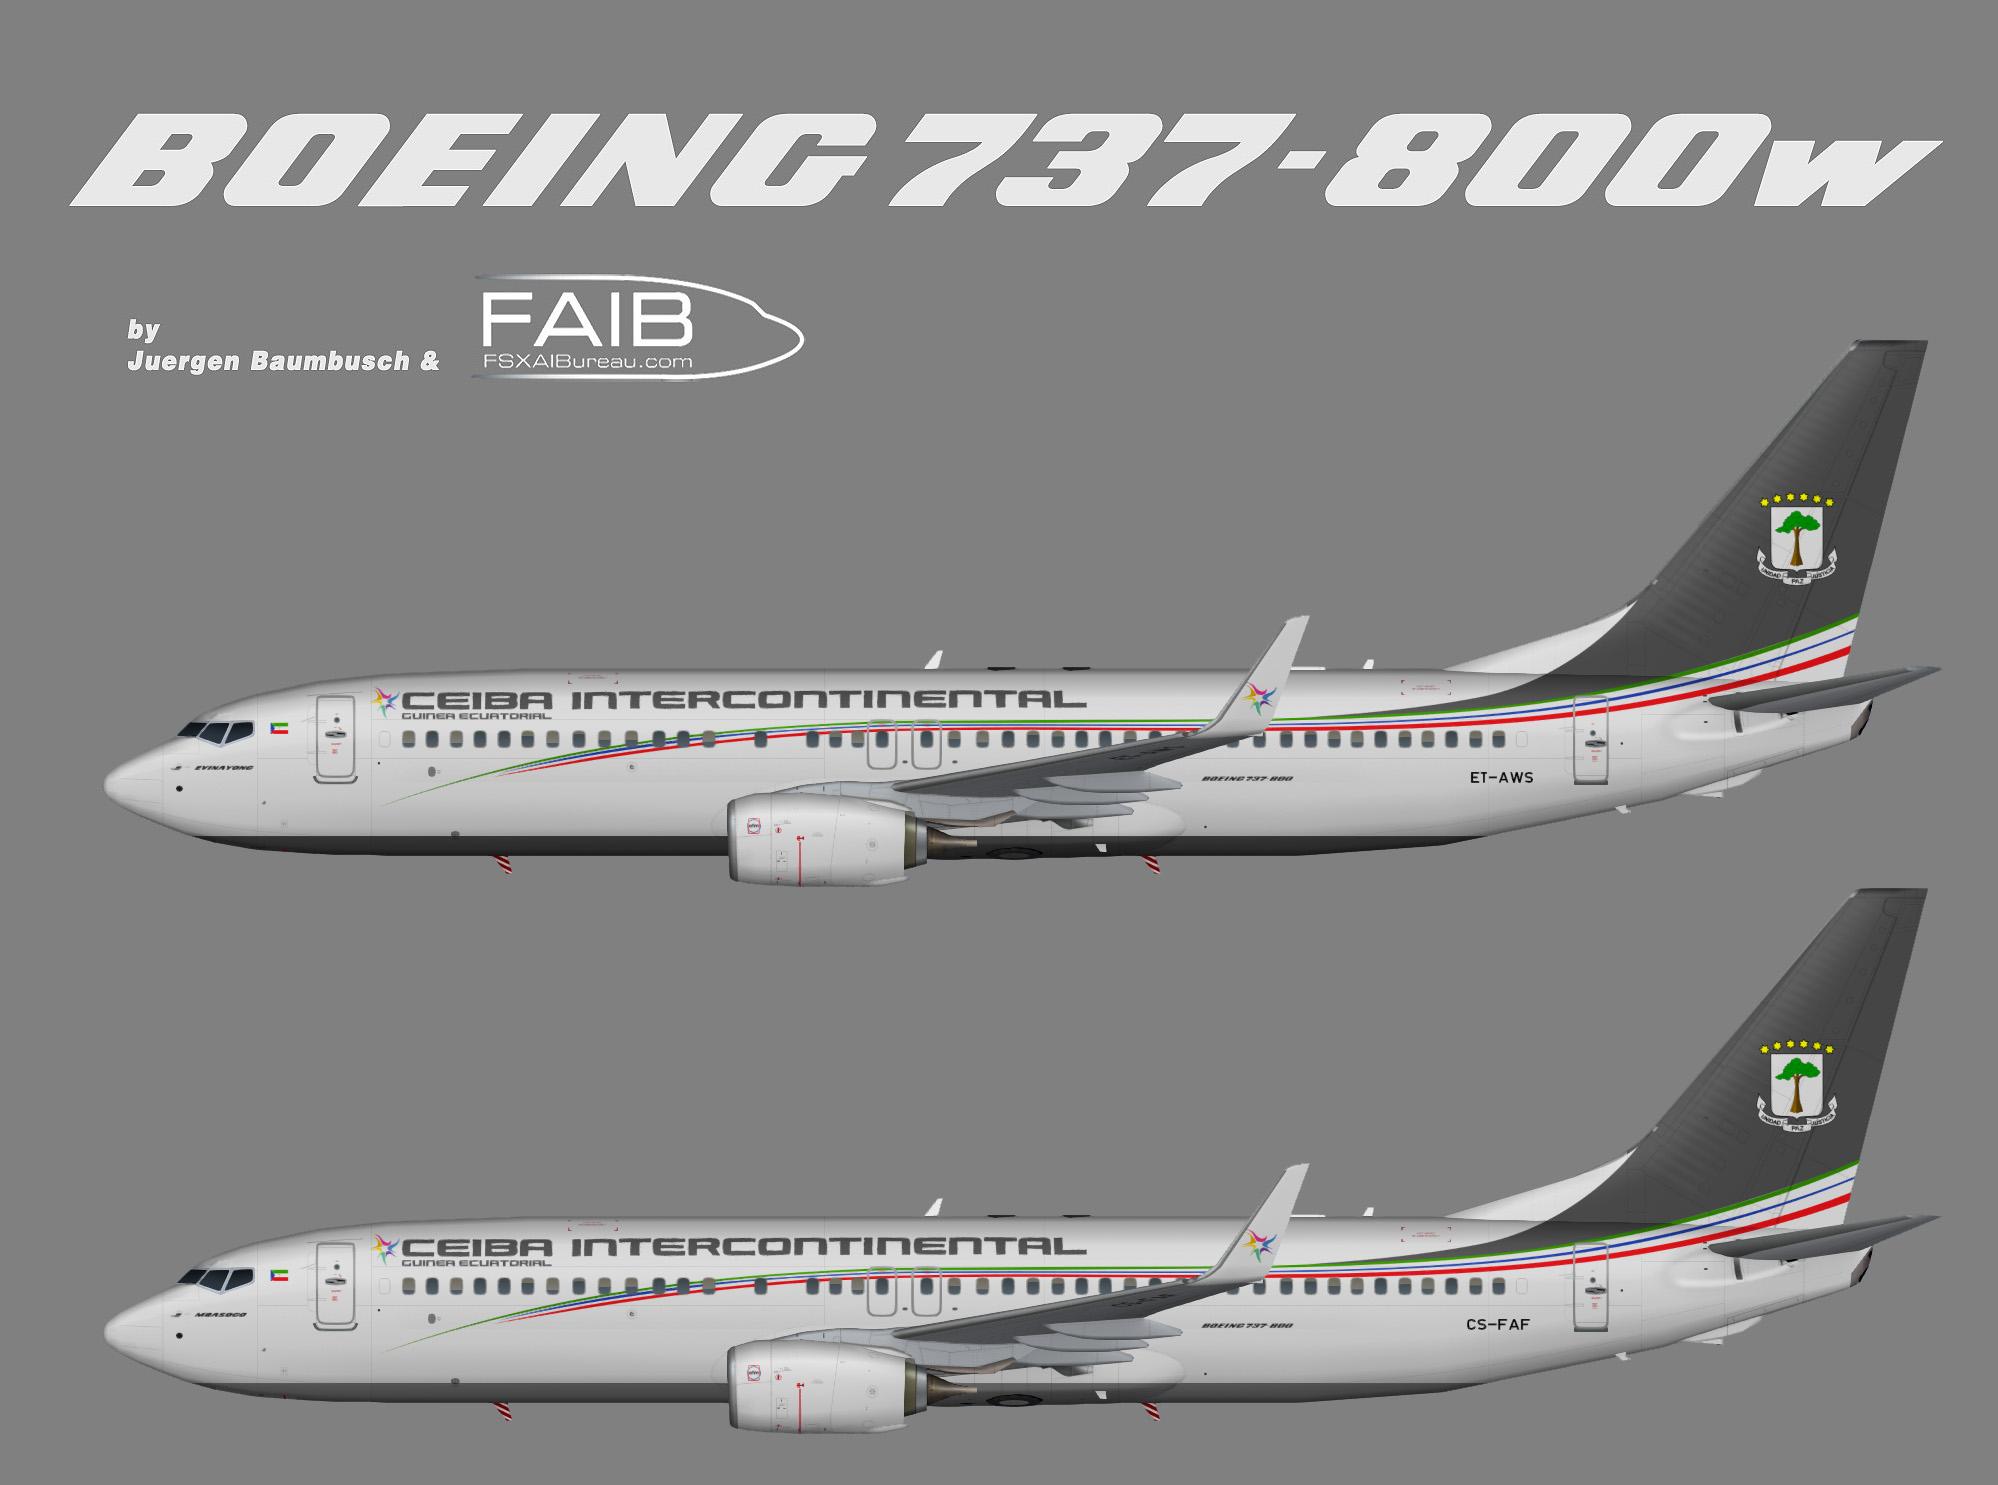 Ceiba Intercontinental Boeing 737-800